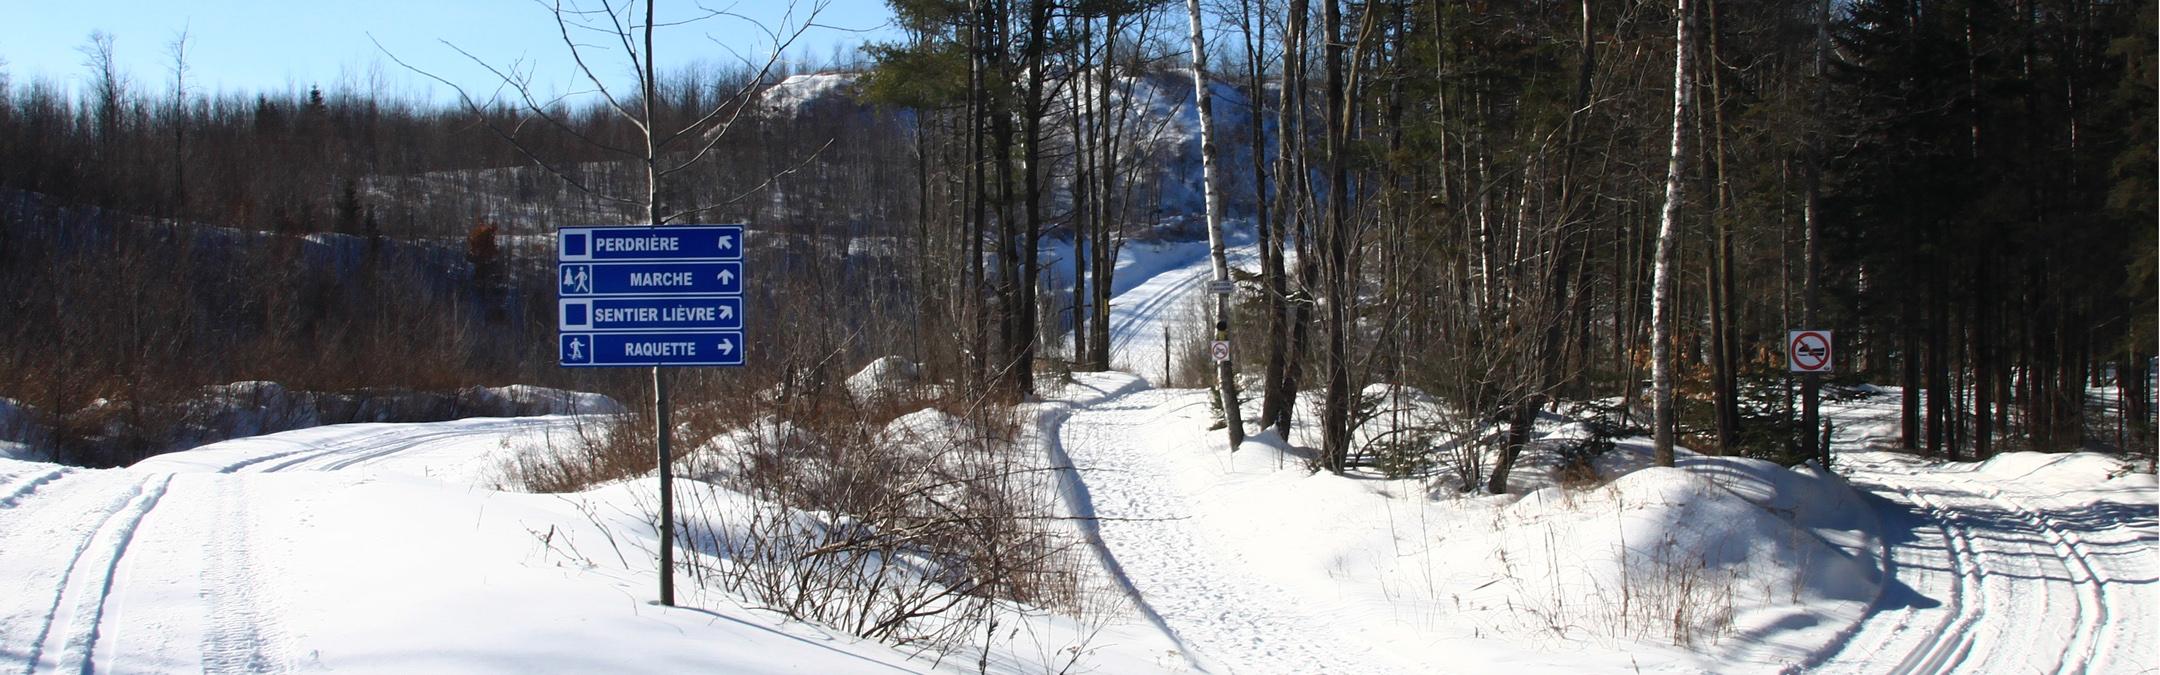 les-sentiers-brandon-winter